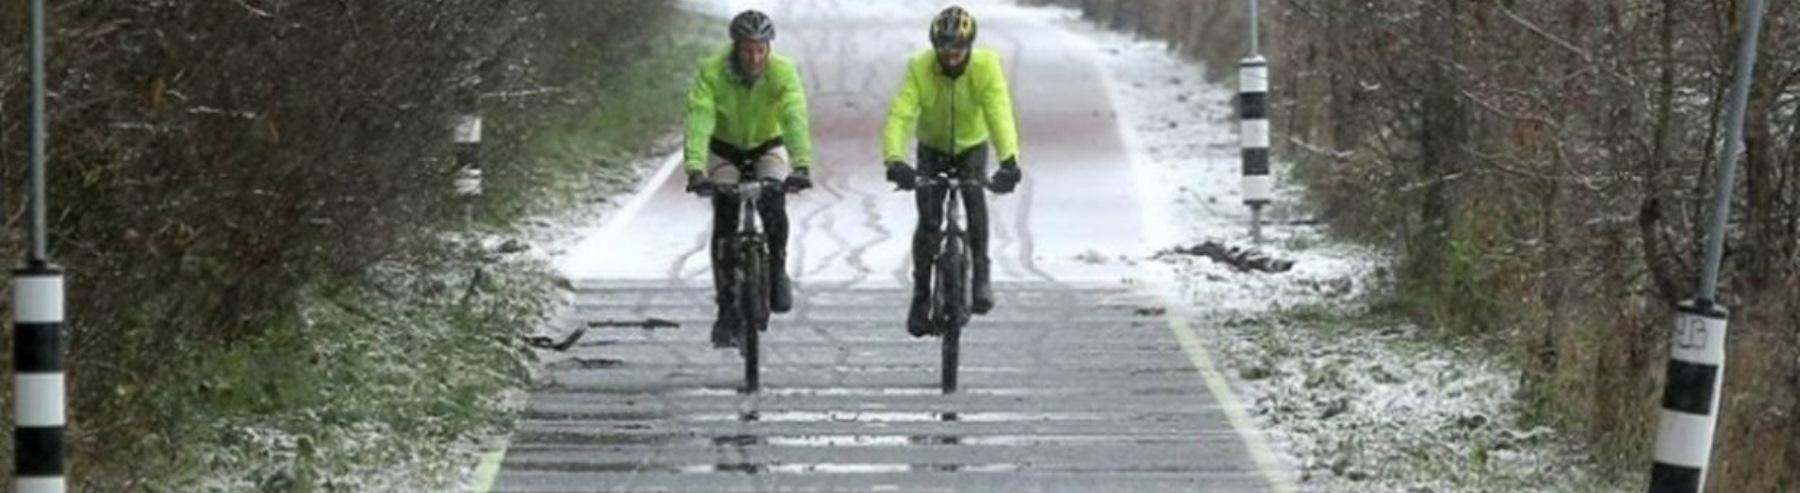 Verwarmd fietspad in Wageningen